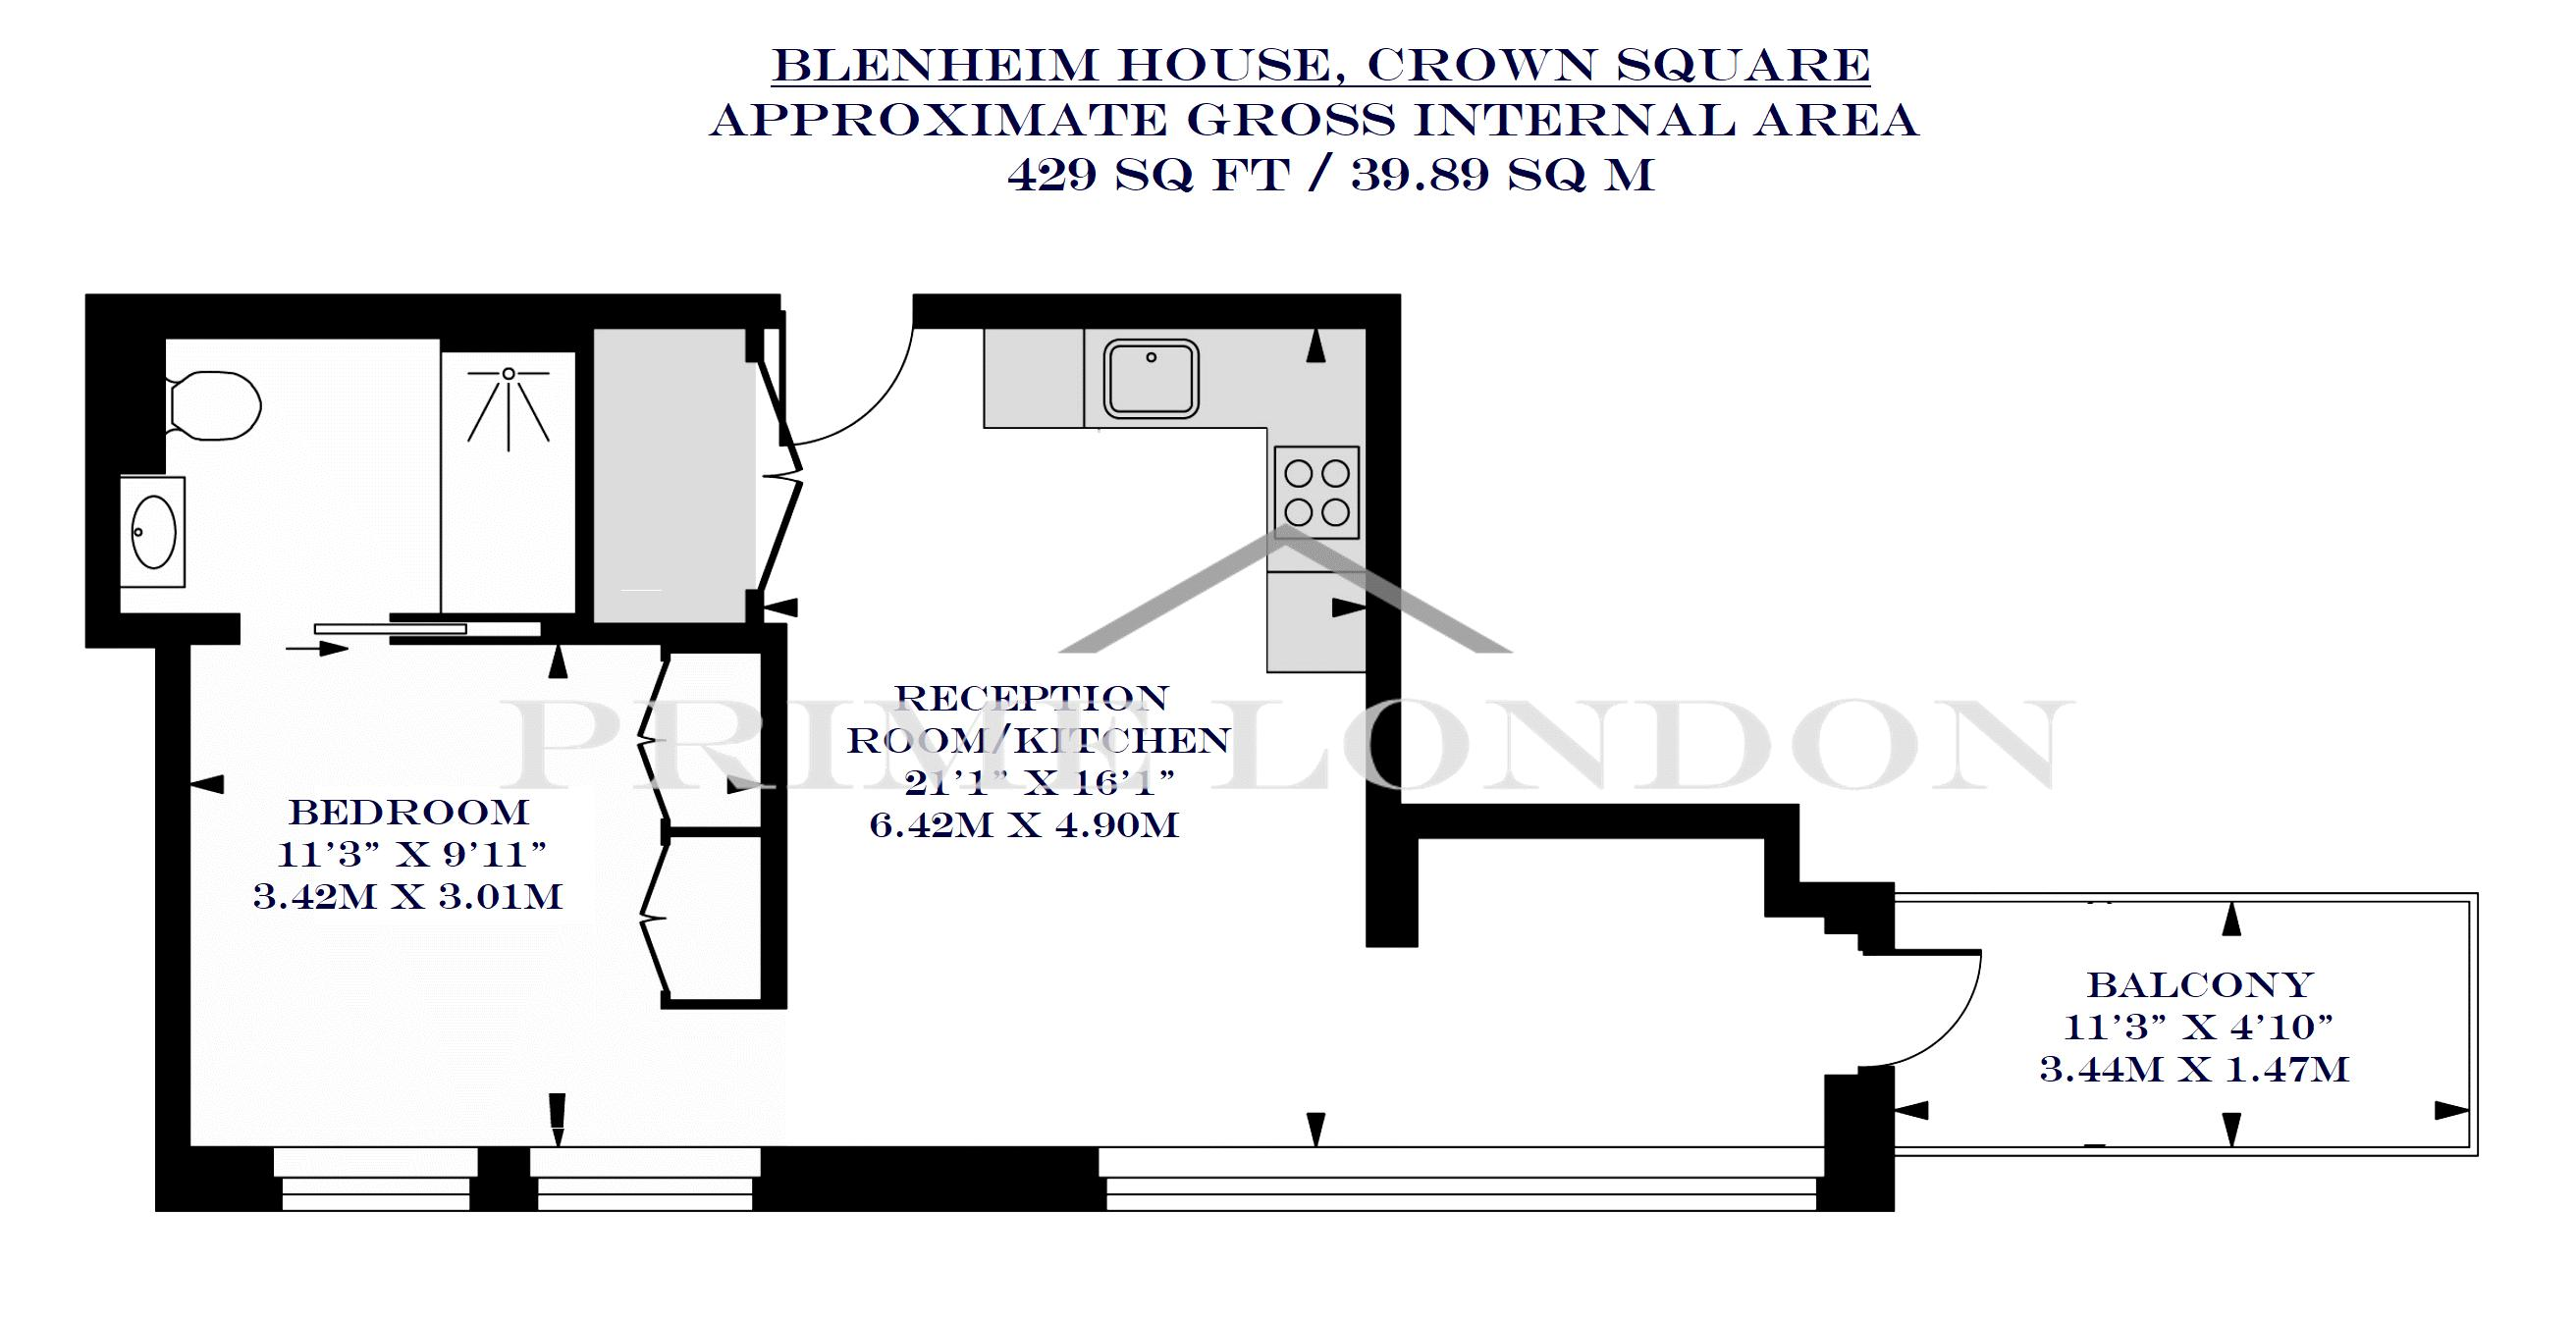 Blenheim House Crown Square